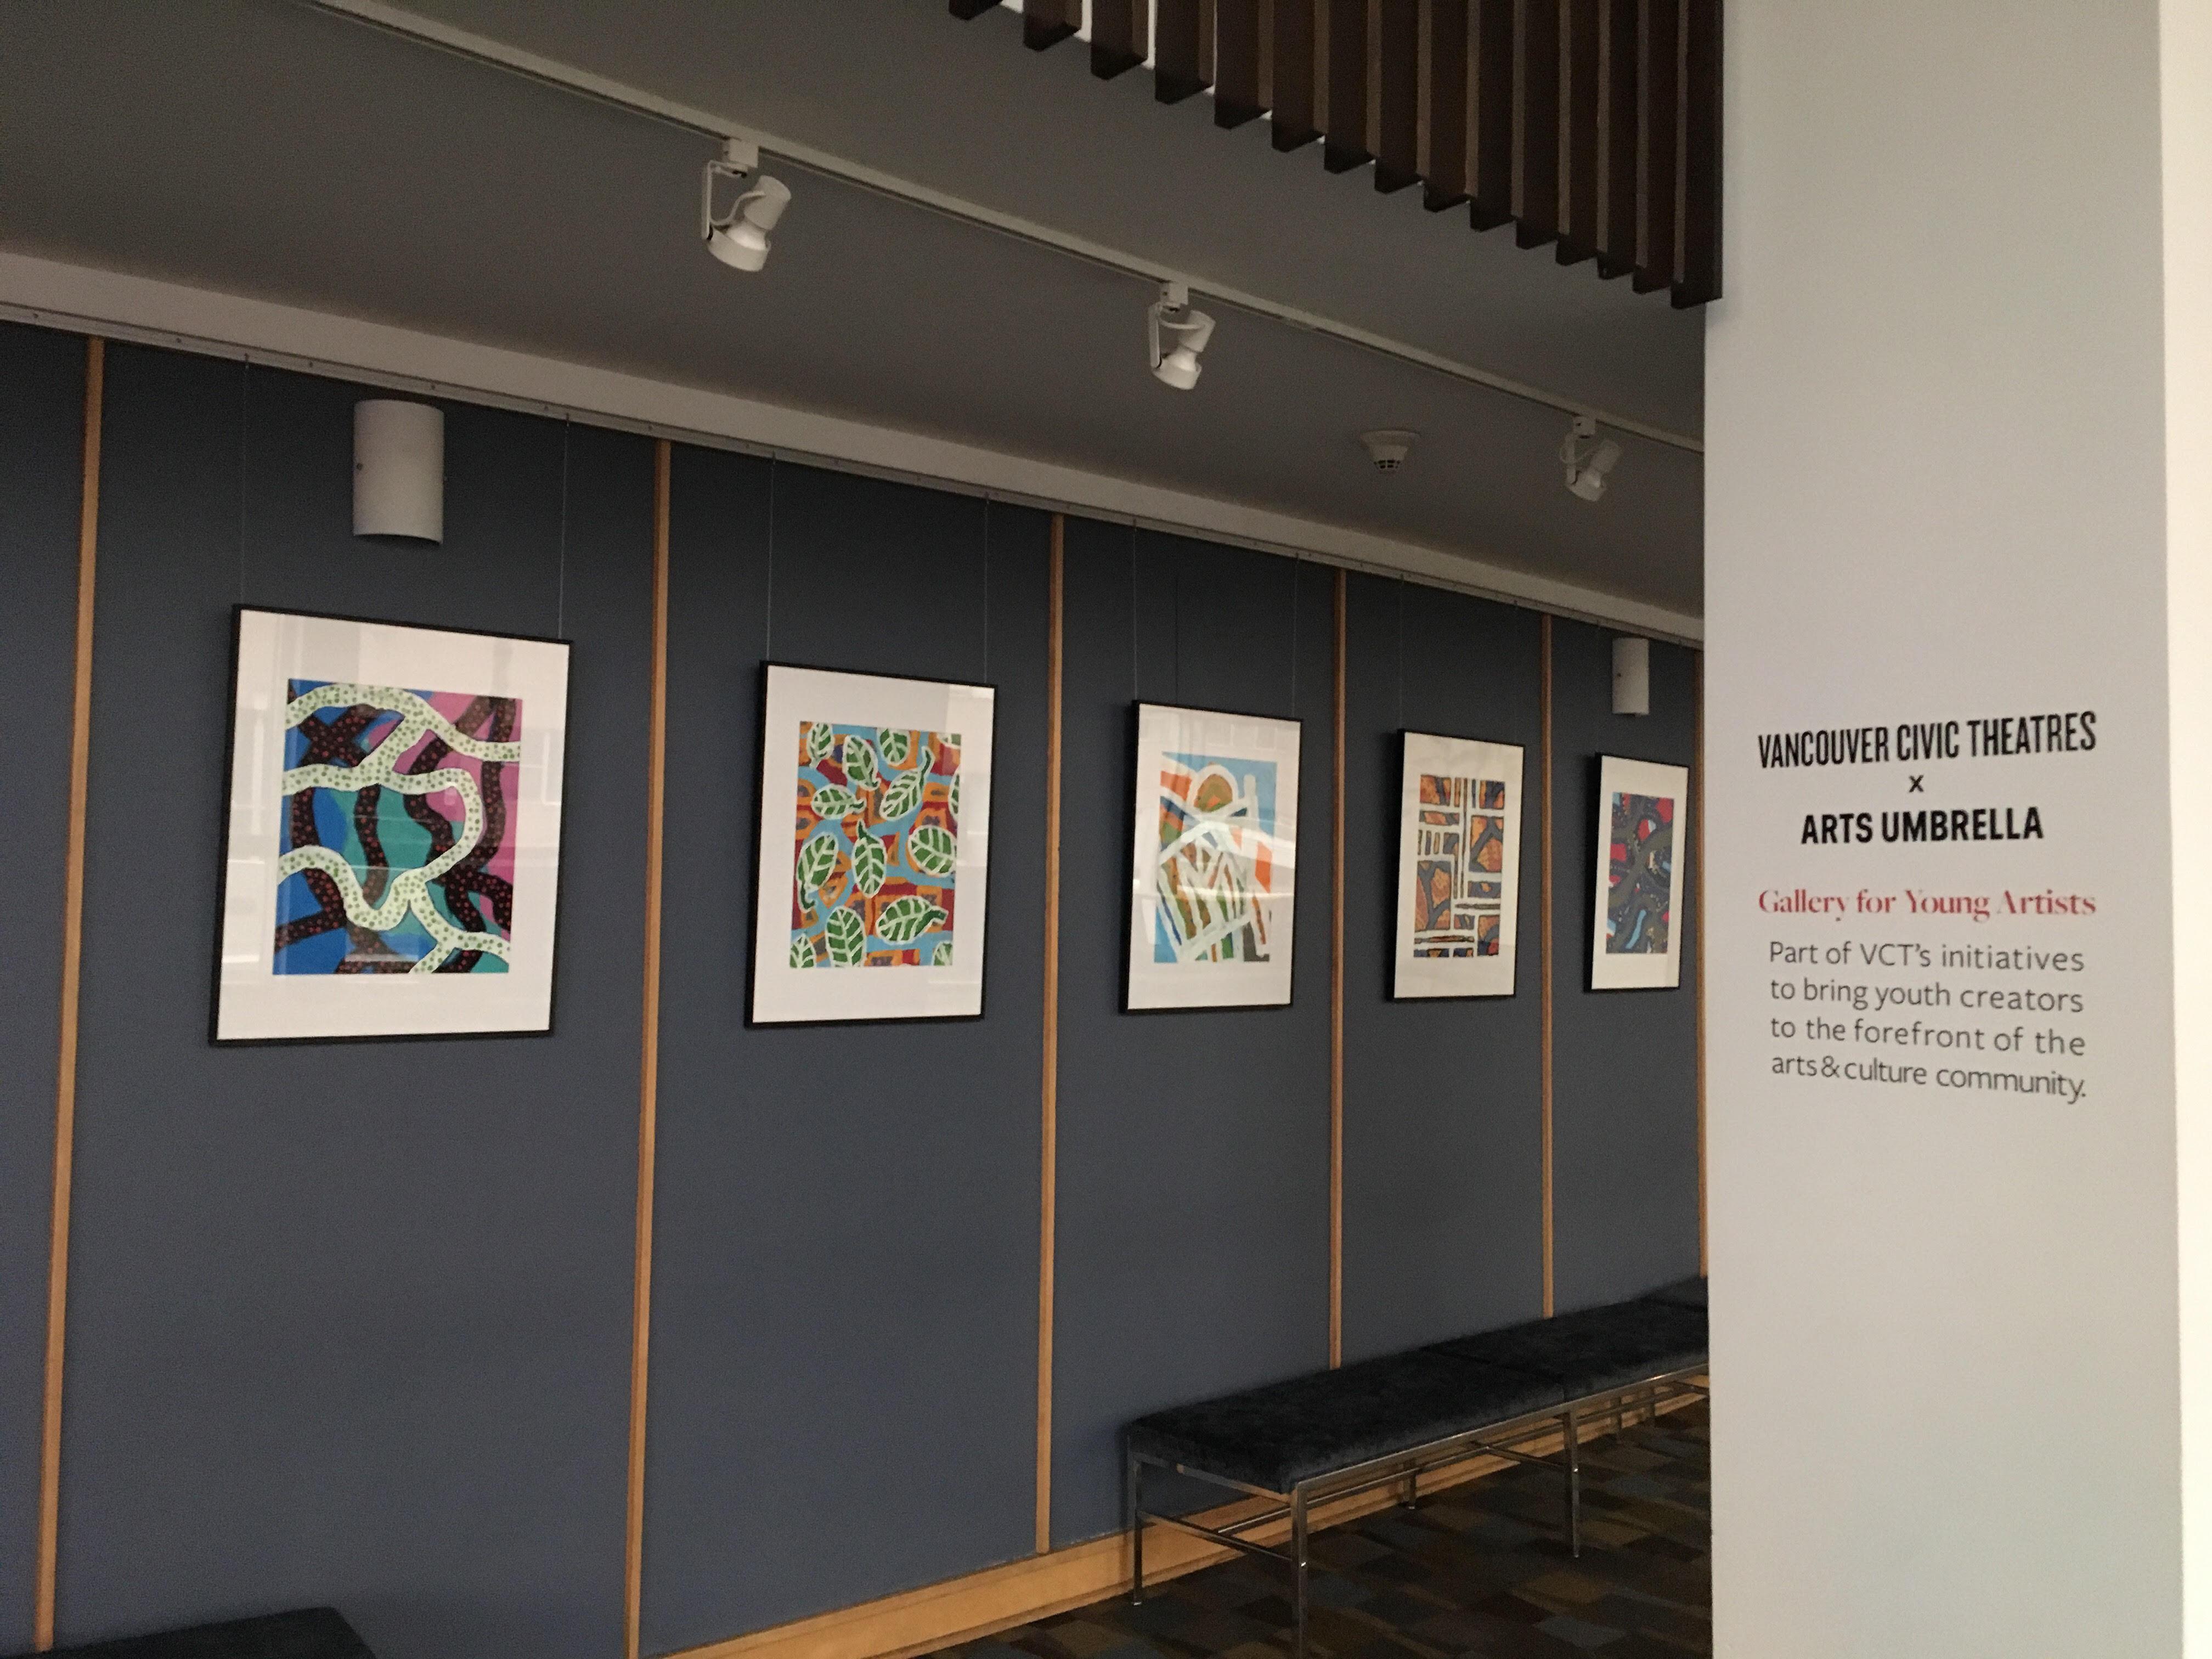 Arts Umbrella exhibit